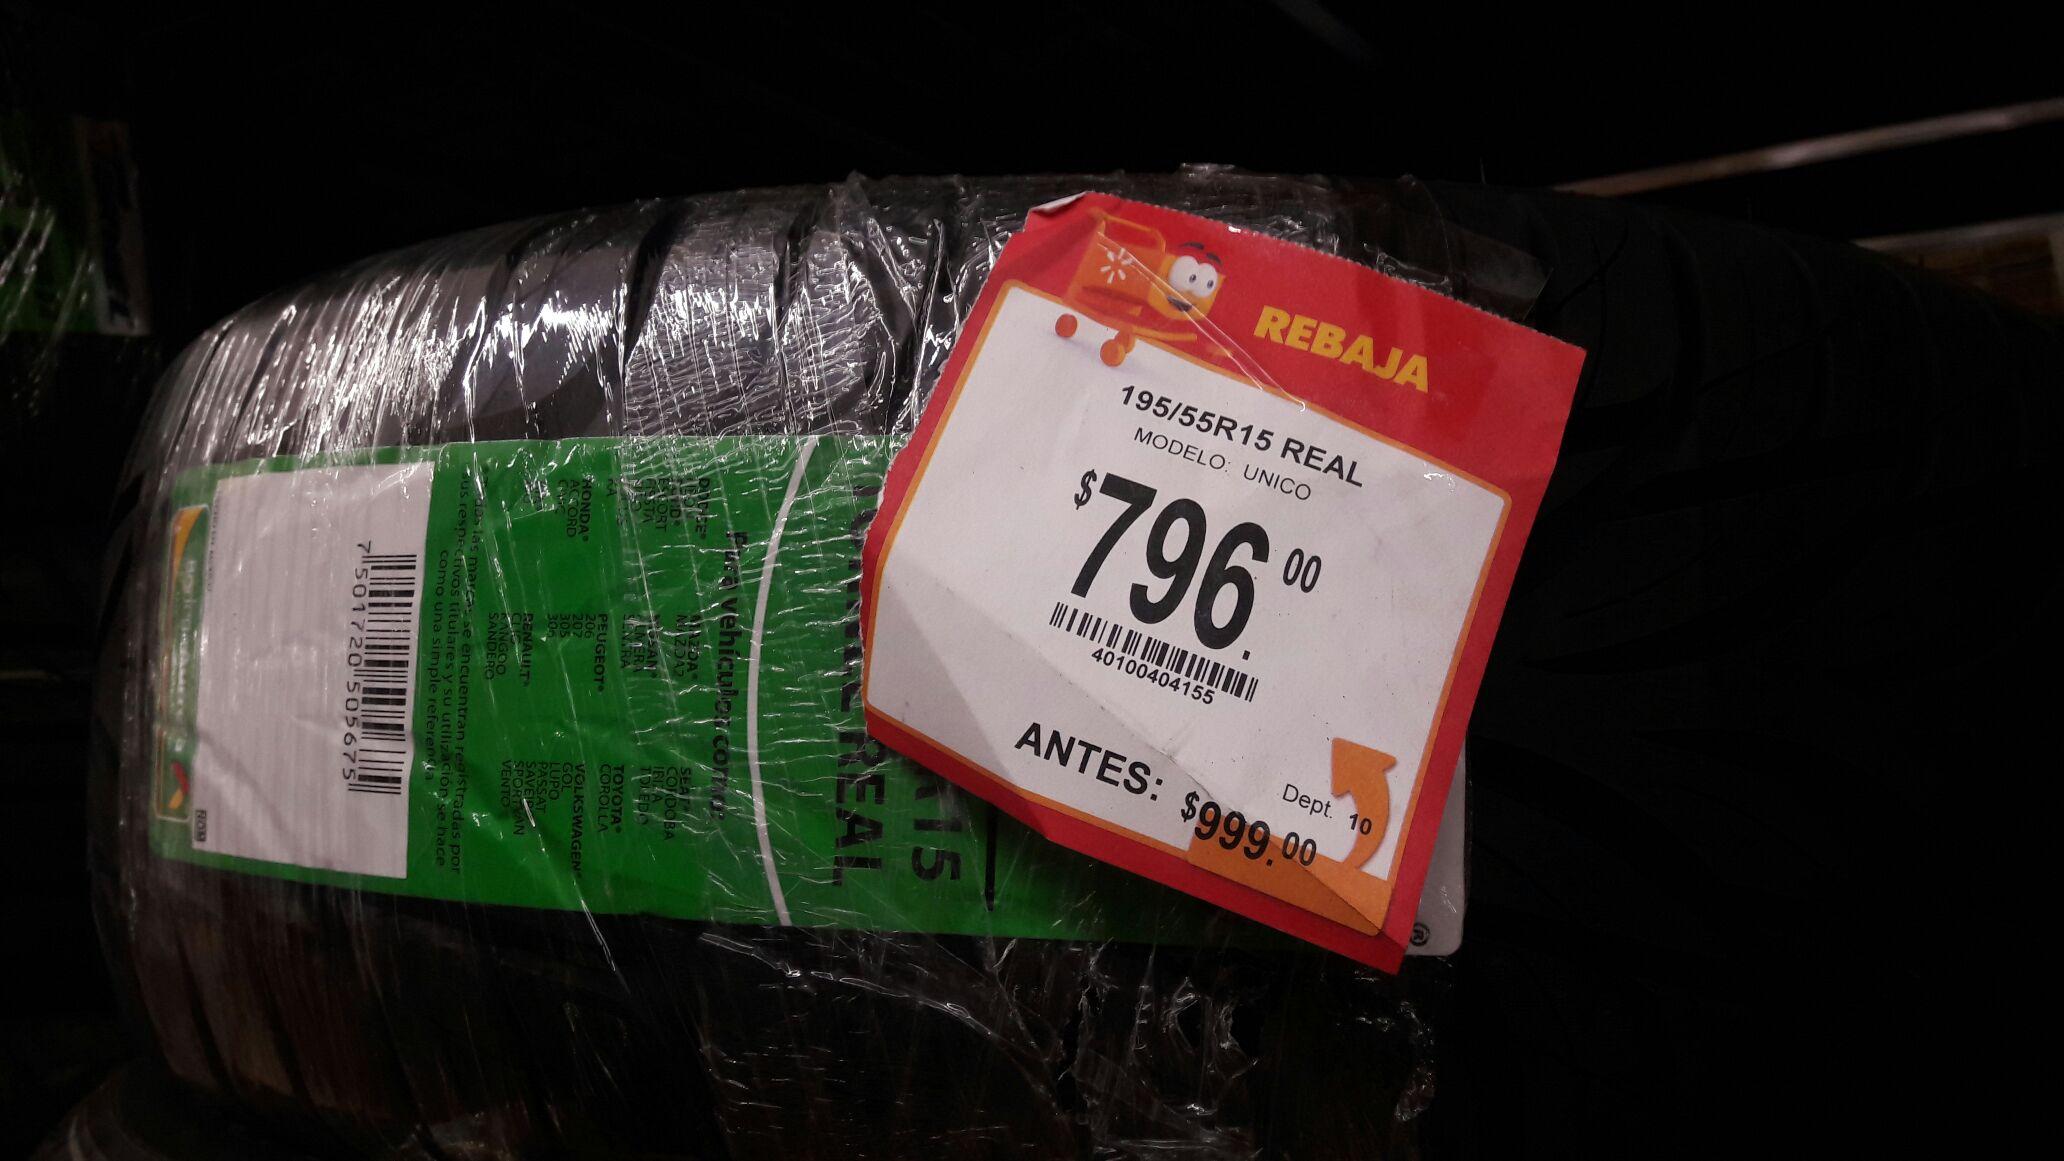 Walmart: Tornel Real 195/55 R15